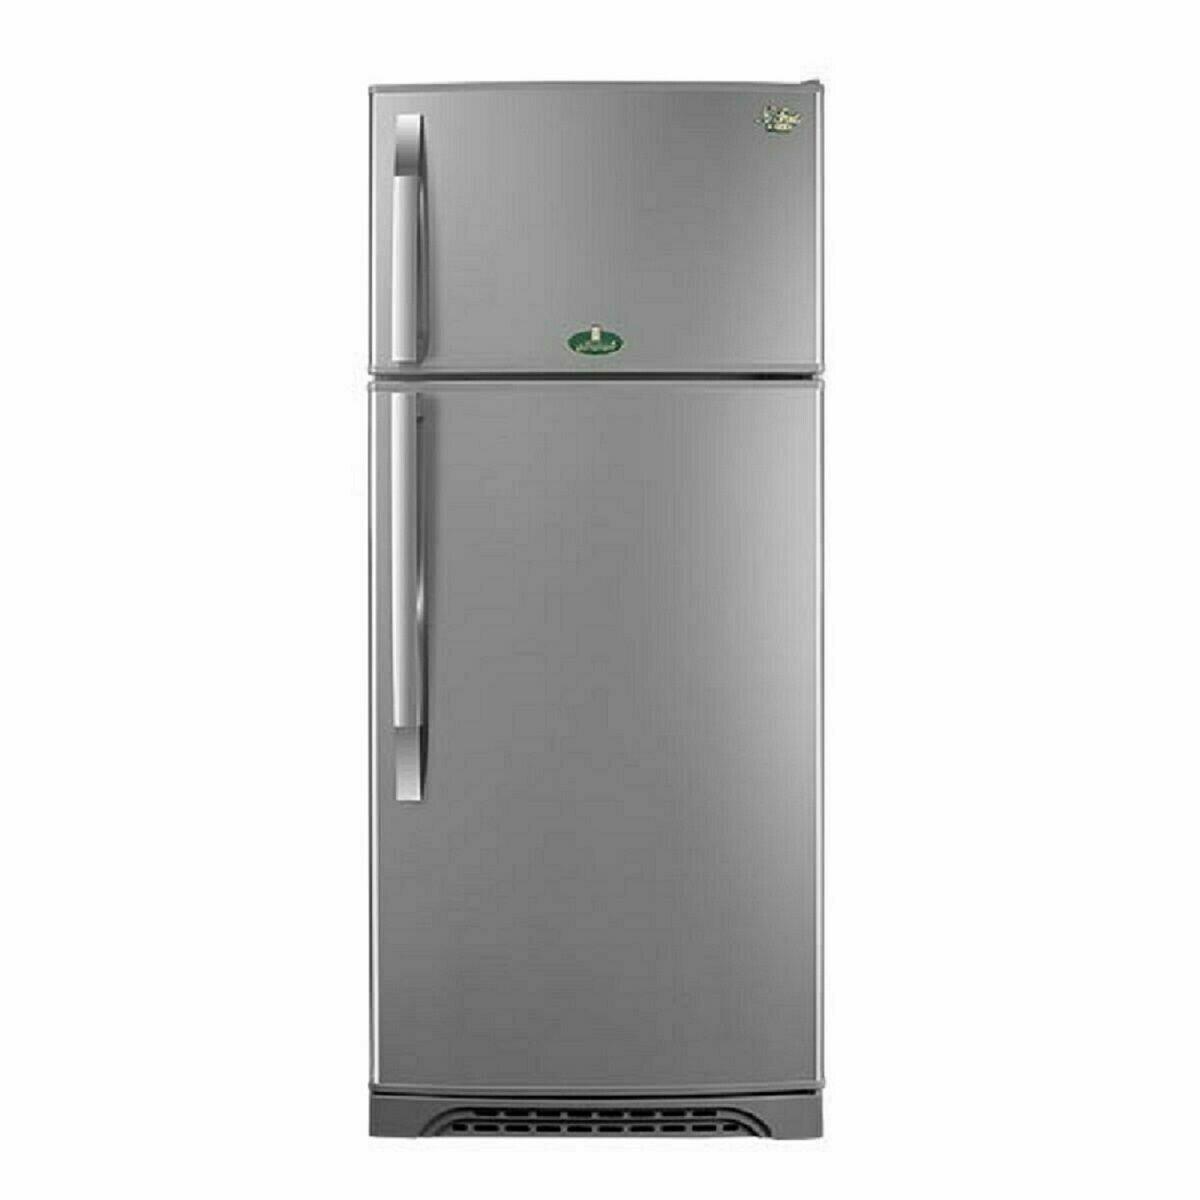 Kiriazi Refrigerator E500-18 Feet -Twin Turbo Crystal  ثلاجة كريازى 18 قدم توين تربو كريستال